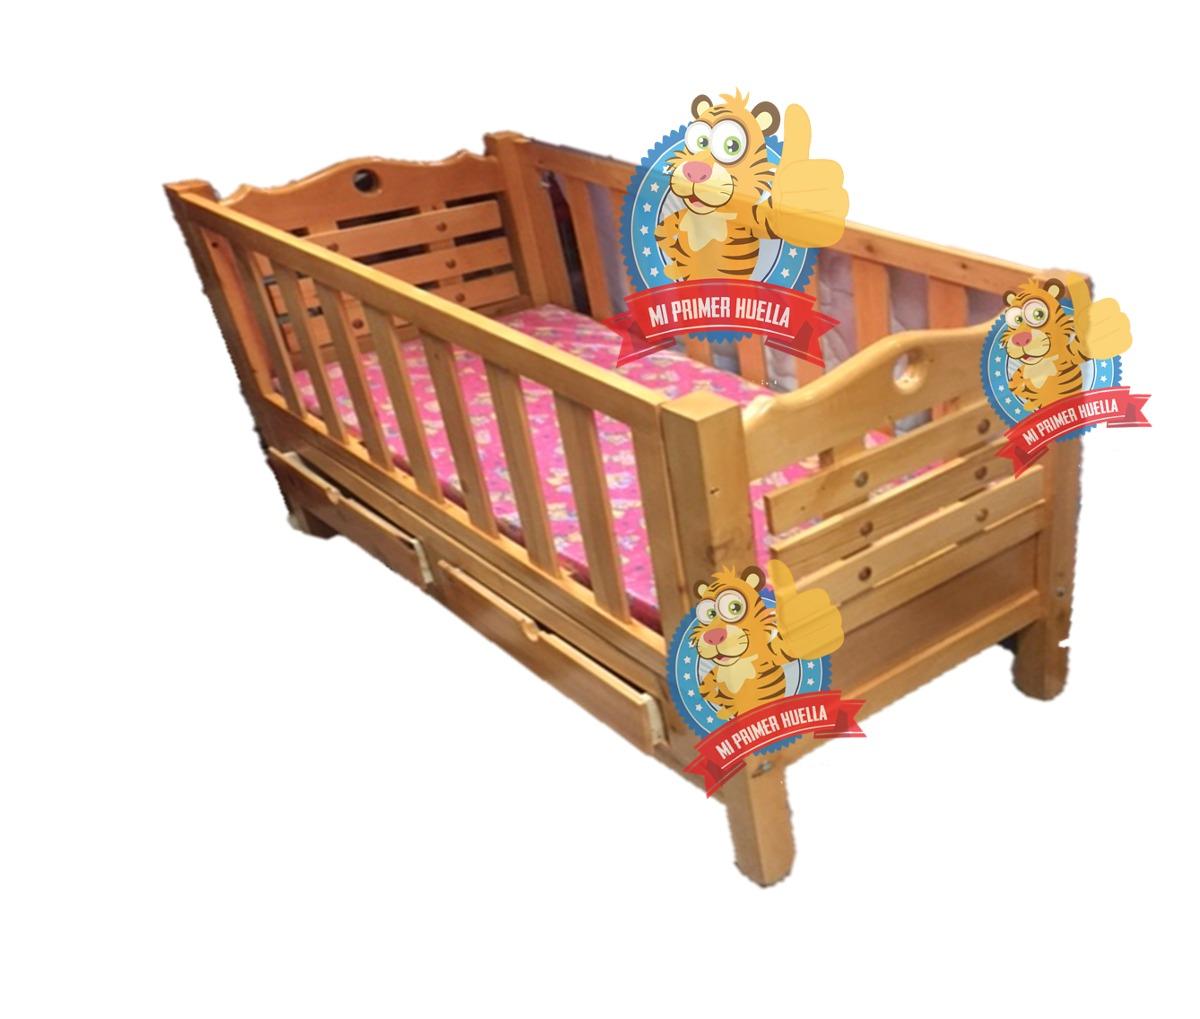 Cuna para bebe en madera 100 70 x de bebe cama cuna en mercado libre - Cambiador bebe para cuna ...